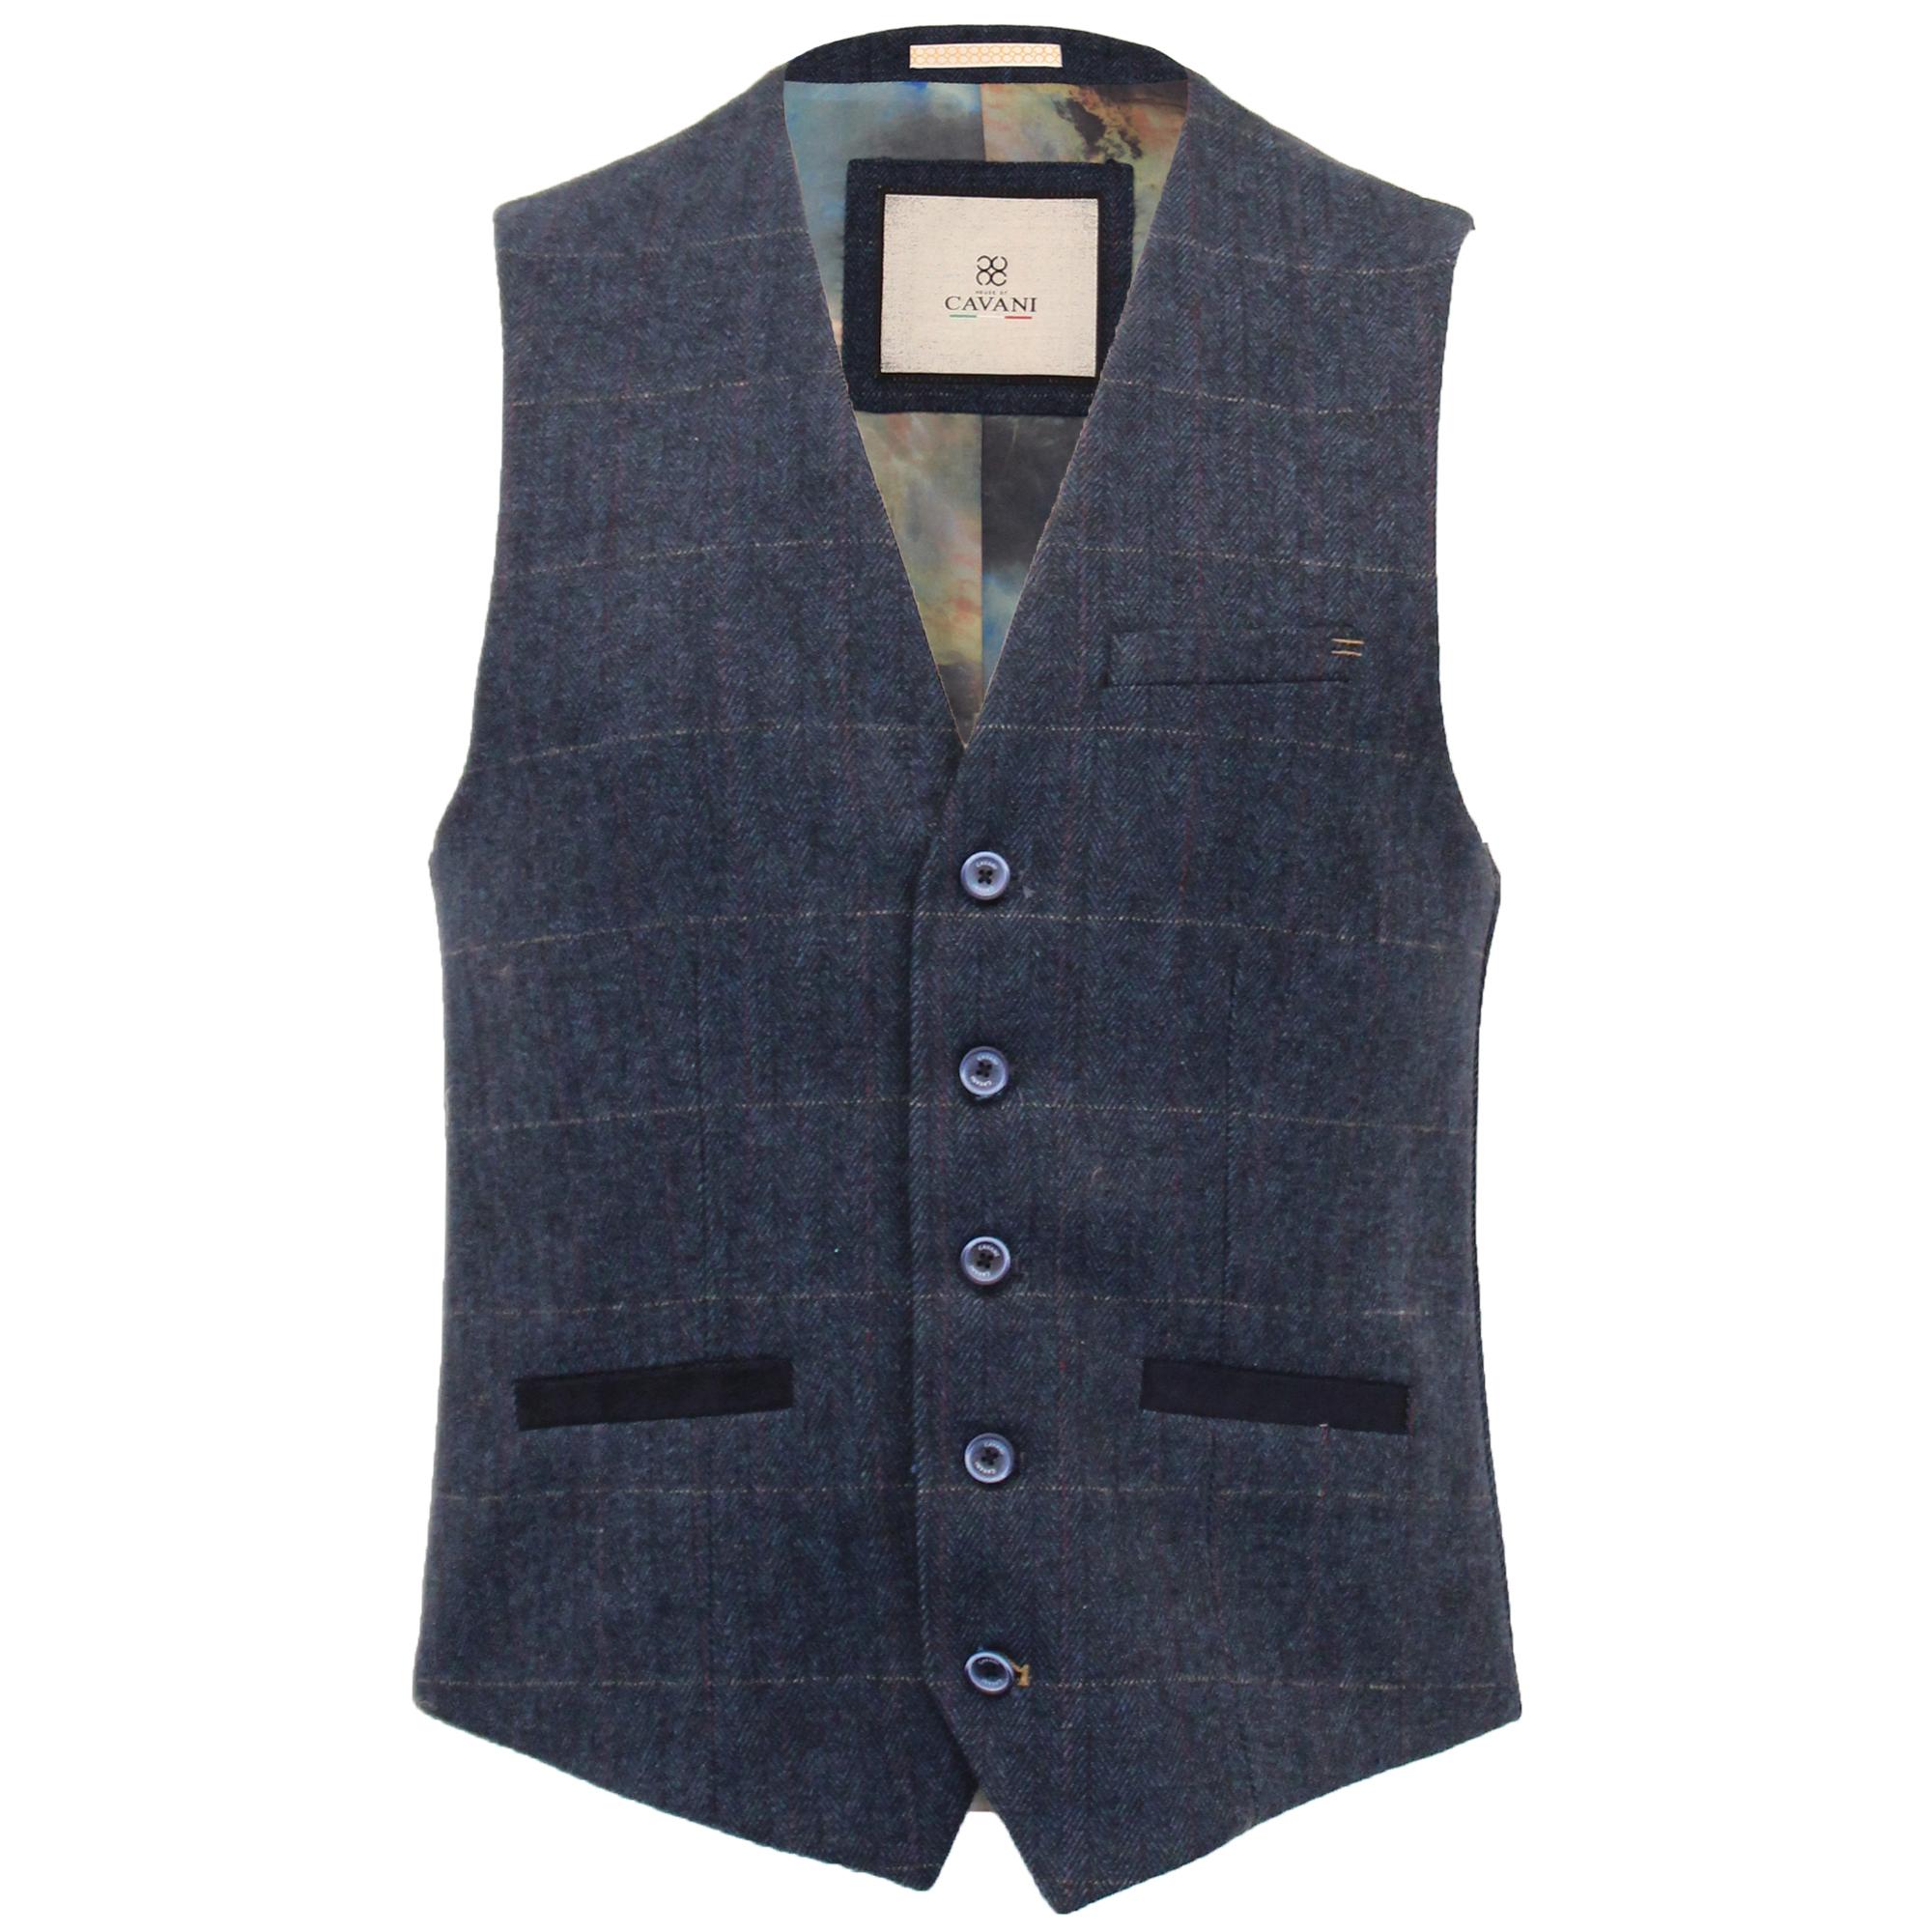 Mens-Wool-Mix-3-Piece-Tweed-Suit-Cavani-CARNEGI-Checked-Peaky-Blinders-Party-New thumbnail 7